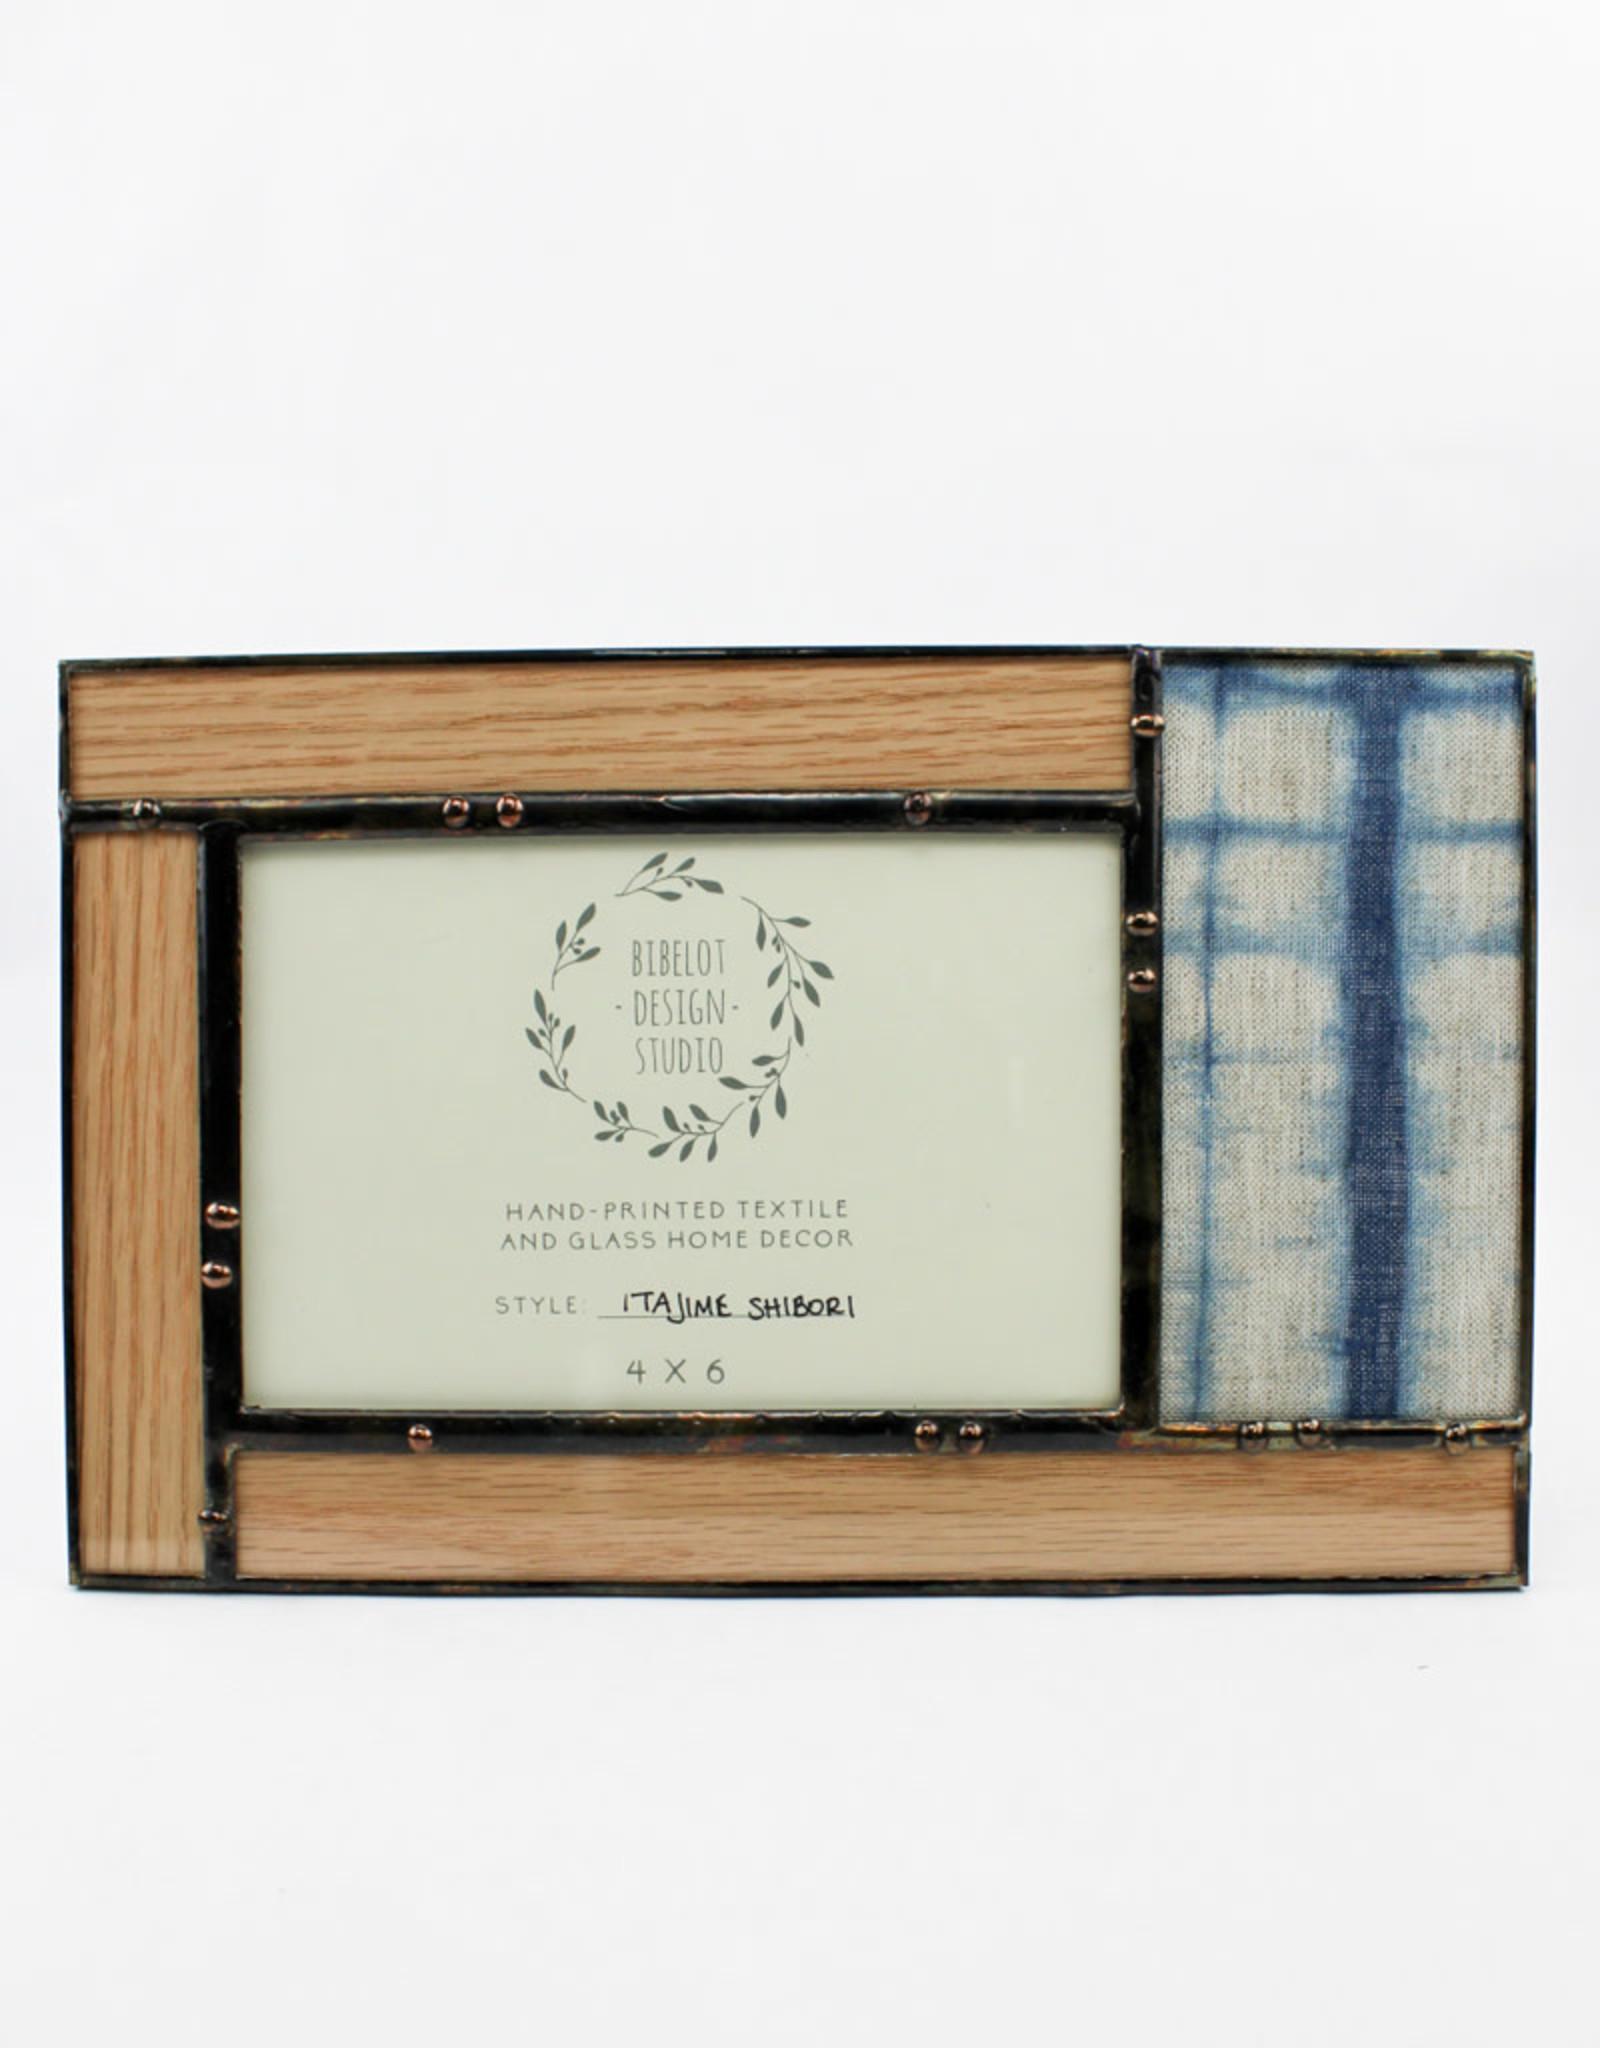 Bibleot Designs 4x6 Itajime Shibori Panel Frame